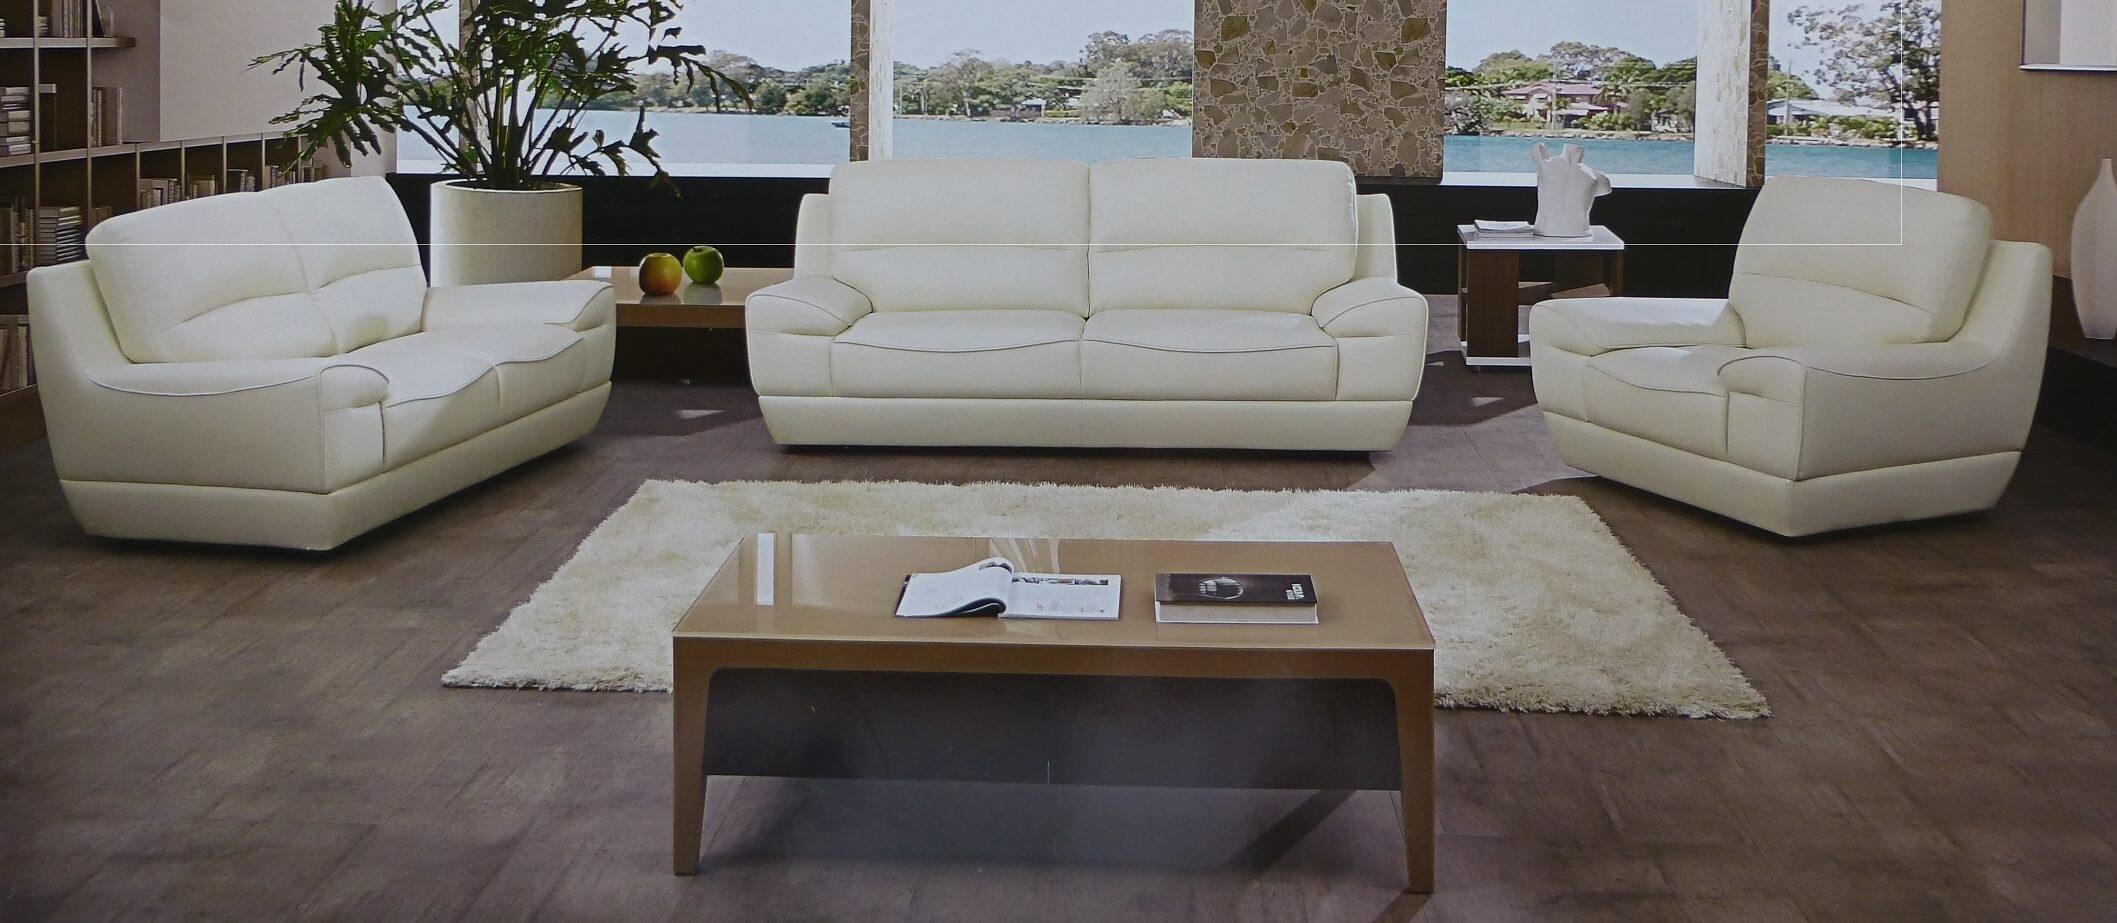 Sofa: Designs White Sofa And Loveseat White Sofa And Loveseat Set In Off White Leather Sofas (Image 9 of 10)